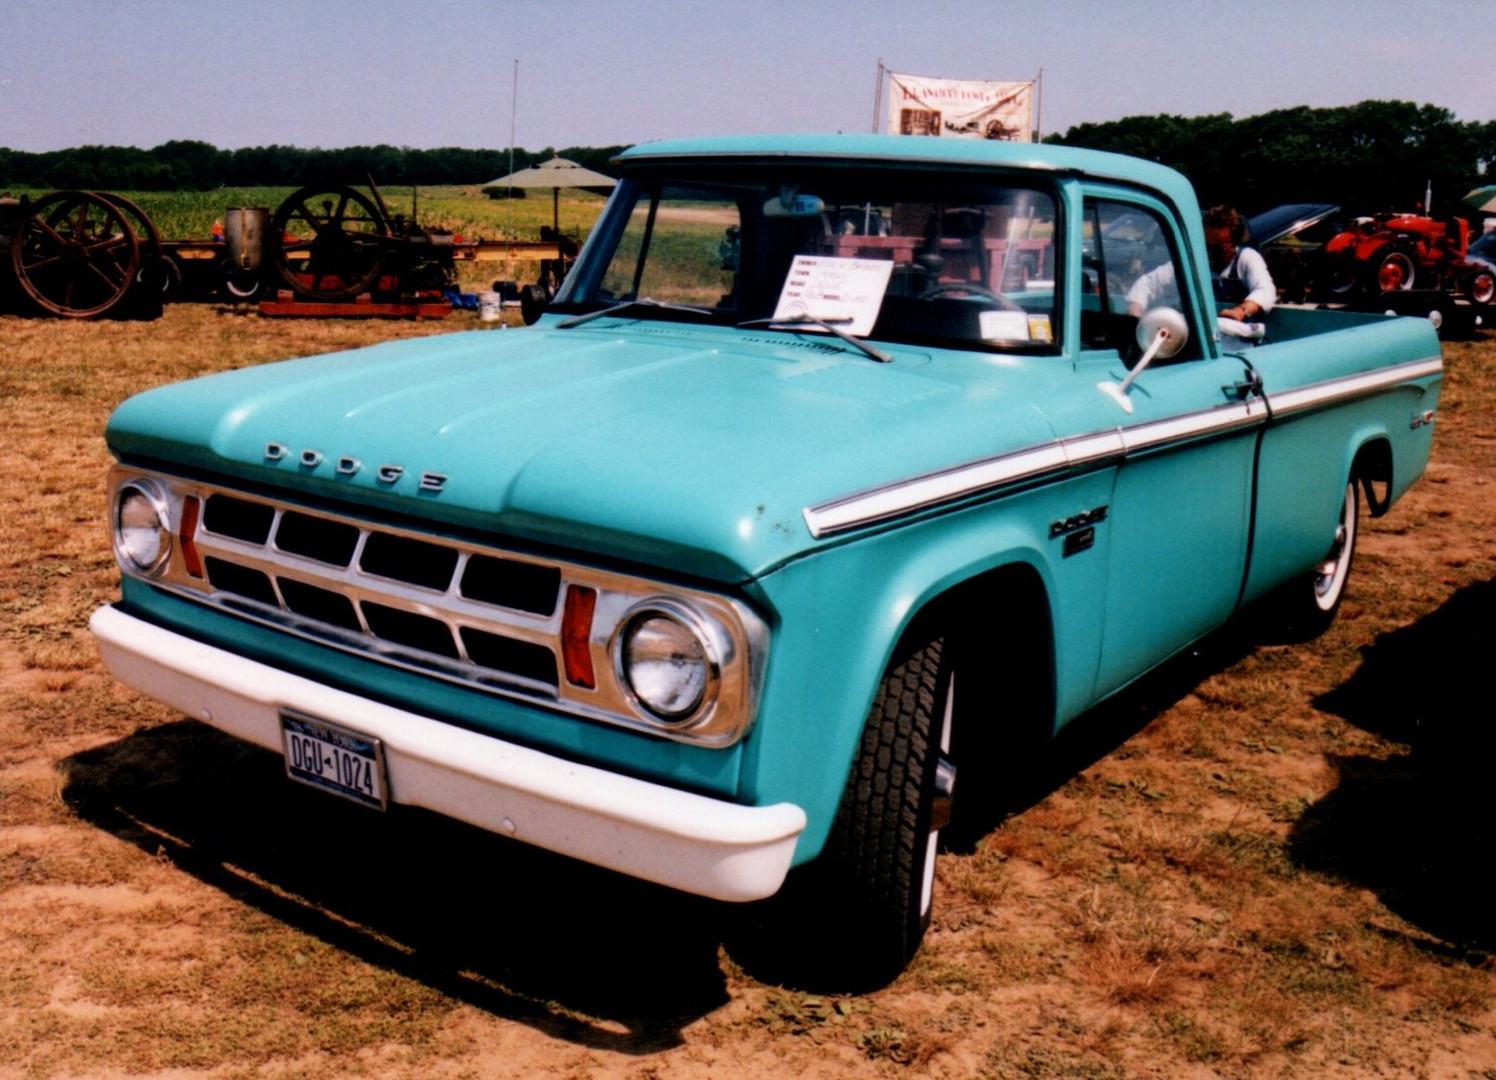 1968 Dodge D-100 pickup